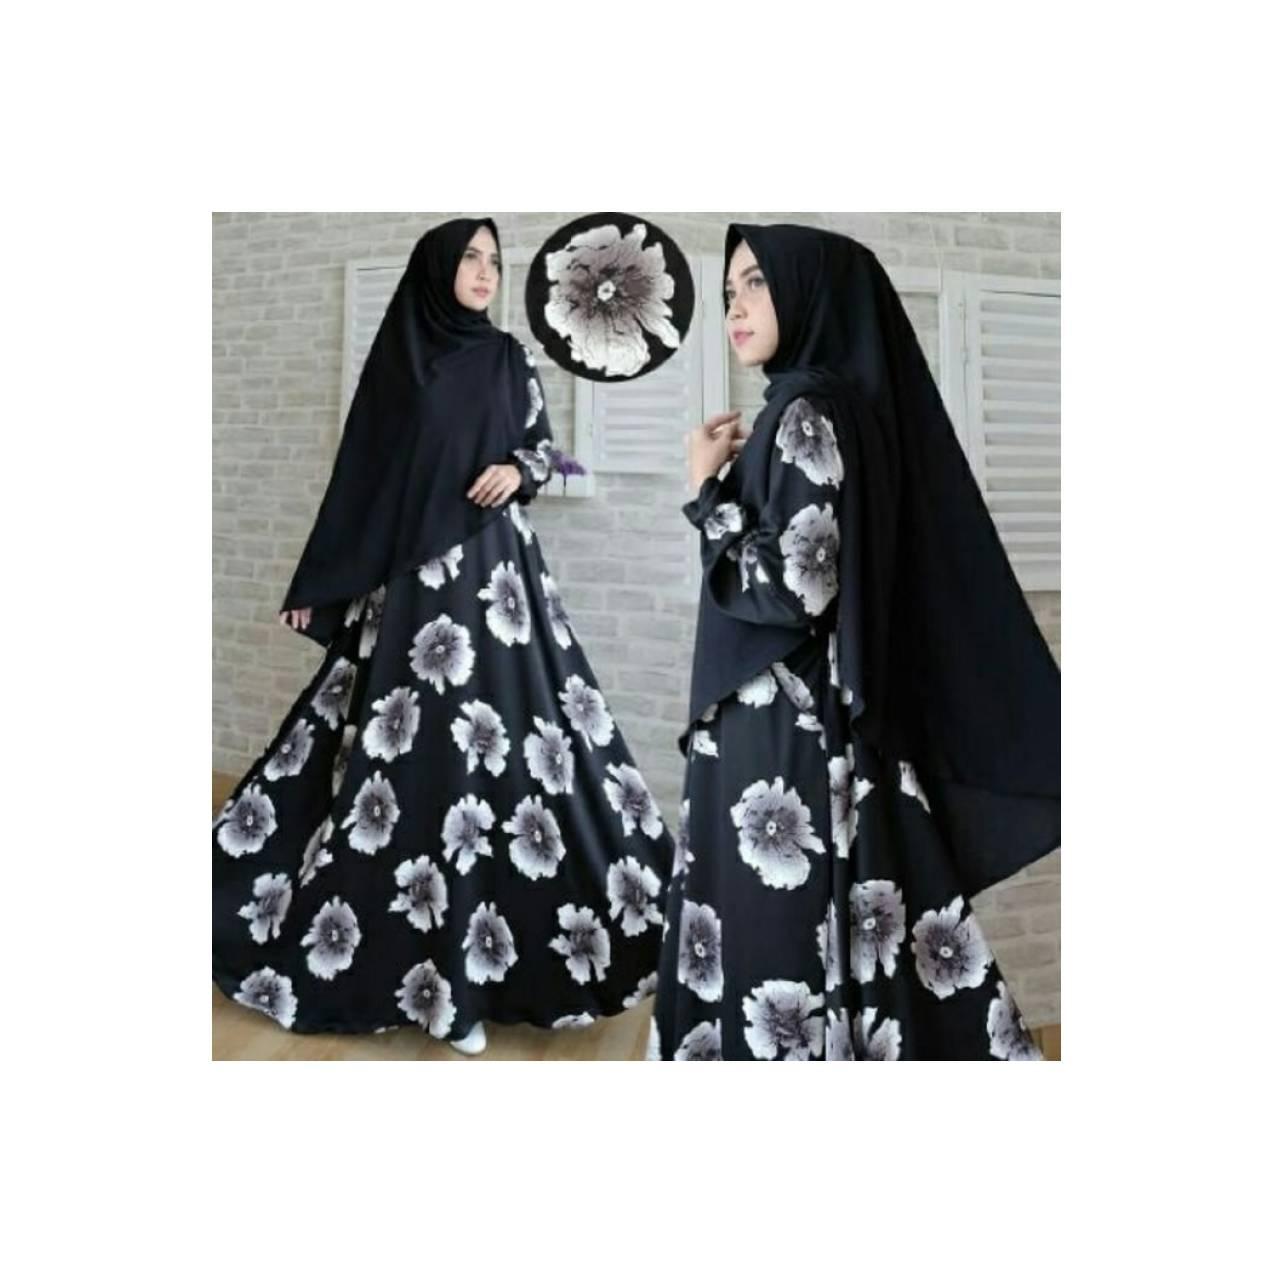 Baju Pengantin Muslimah 120178 GAMIS WANITA ZANITHA SYARI HITAM